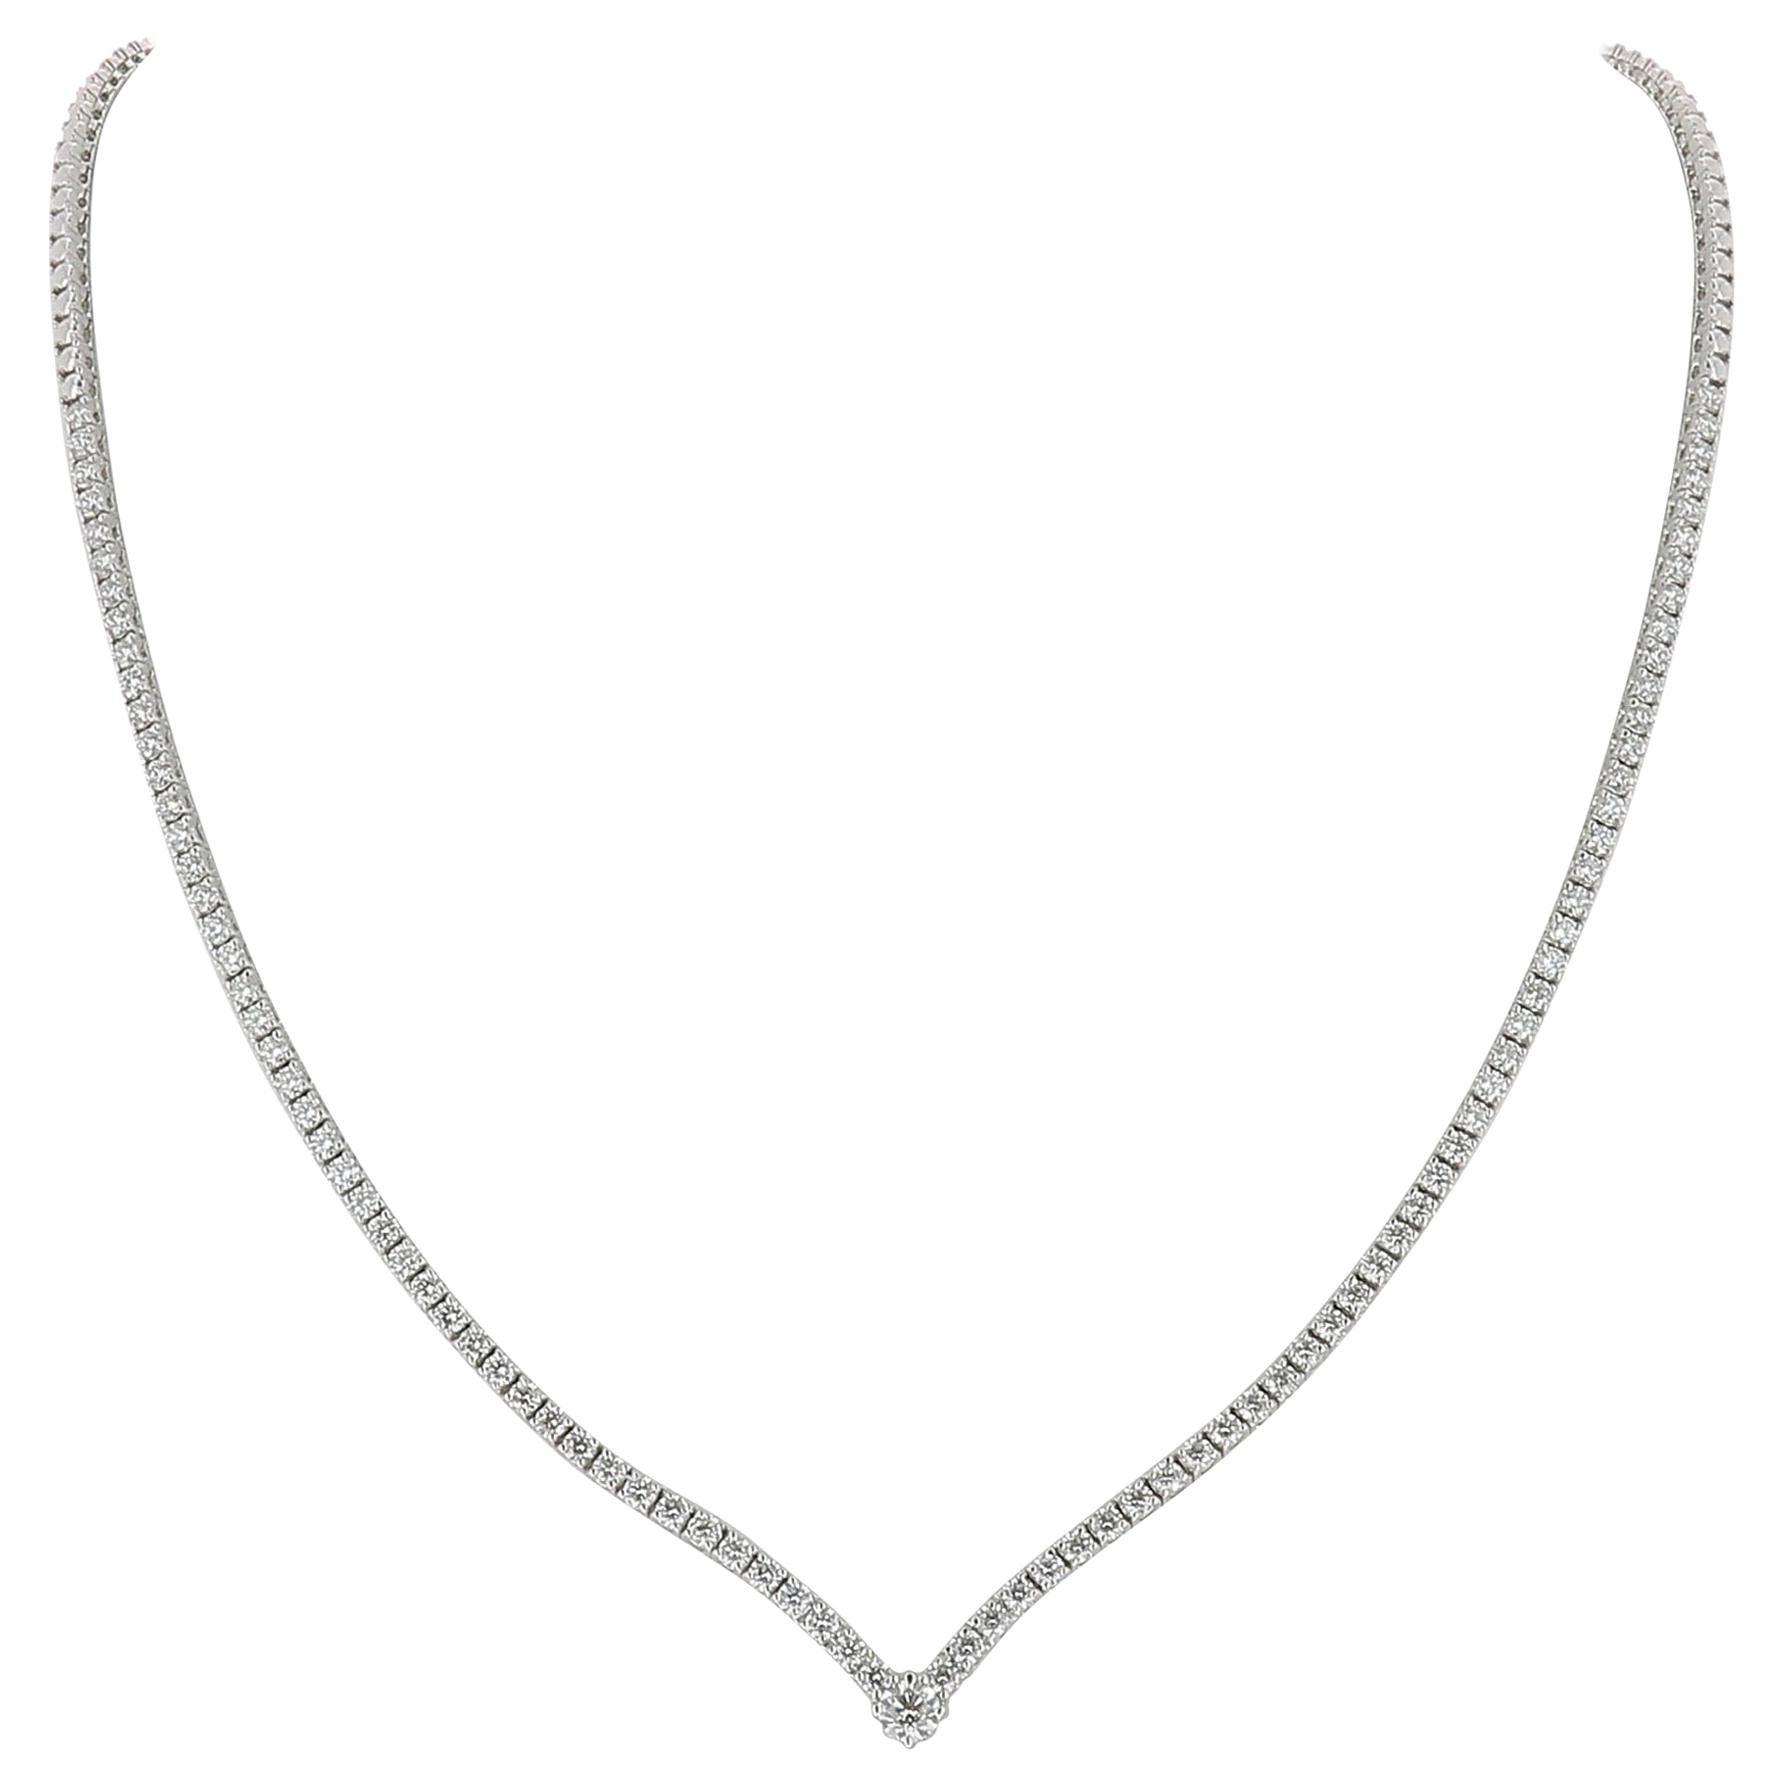 3.25 Carat GVS Round Diamonds Drop Necklace 18 Karat White Gold Riviera Necklace